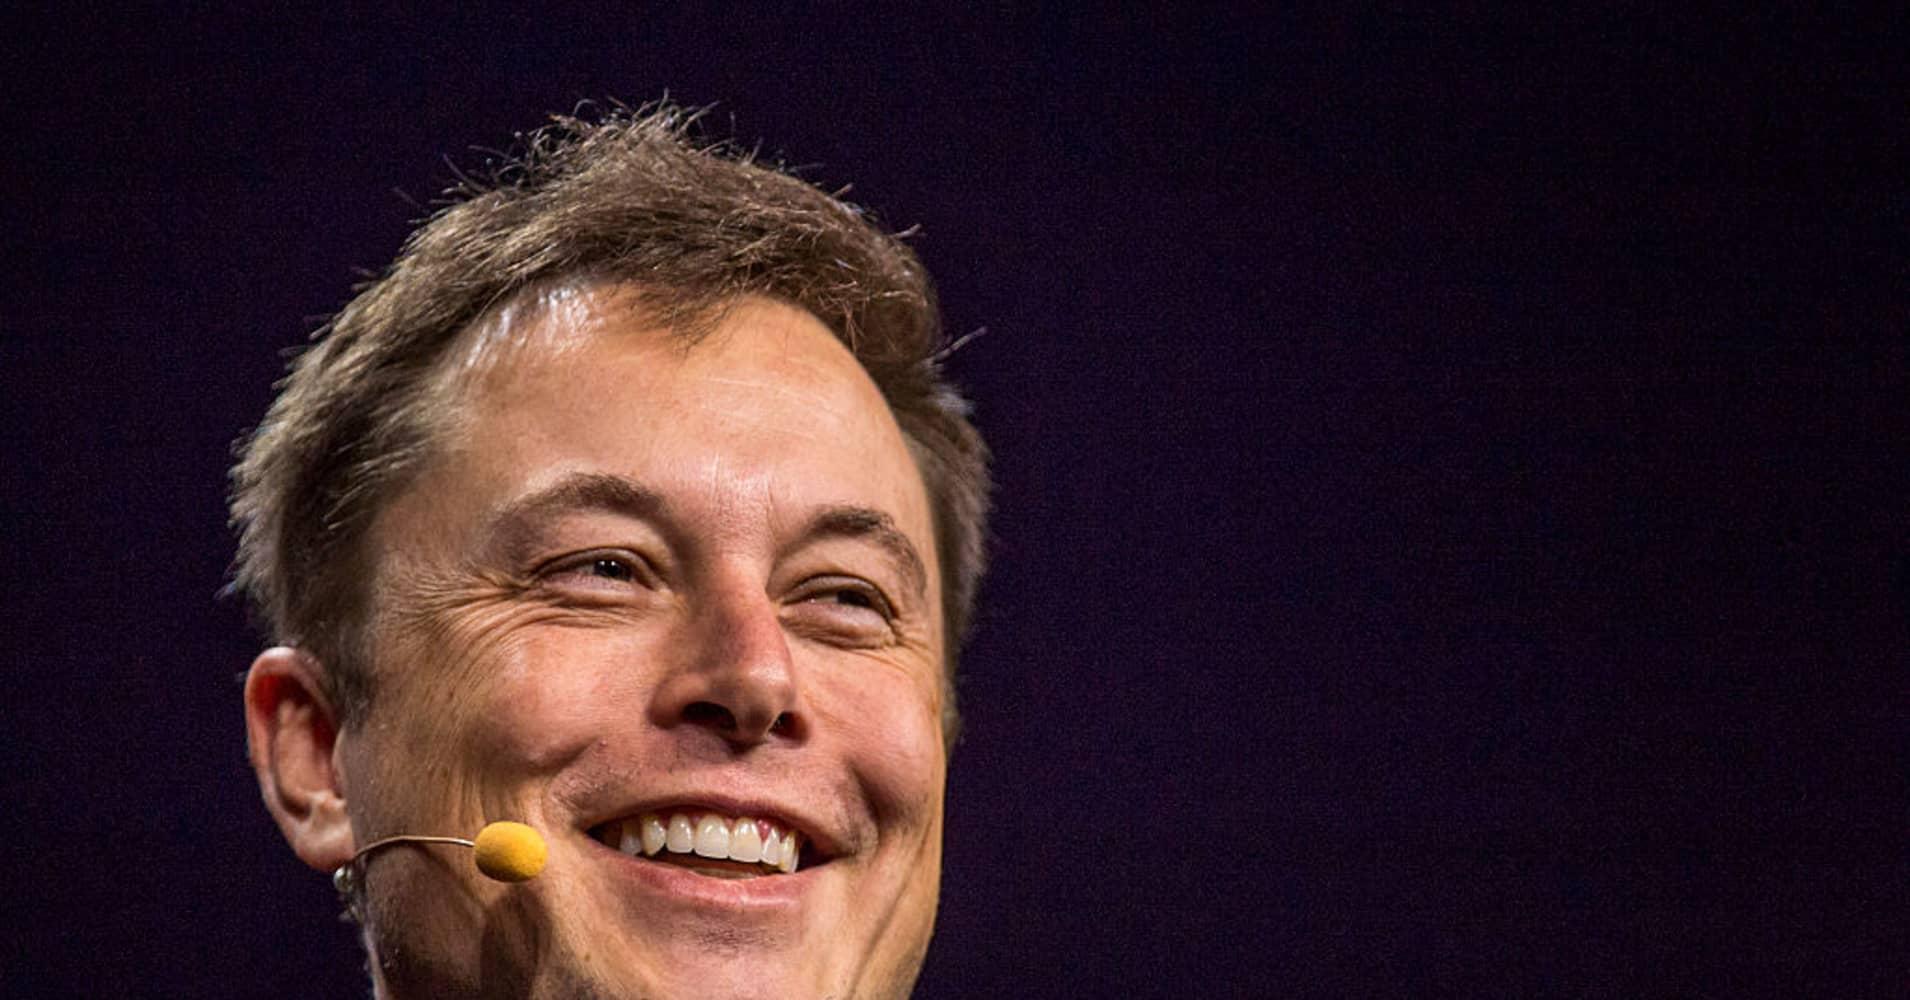 Jeff Bezos Tweets Elon Musk About Spacex Falcon Heavy Rocket Launch